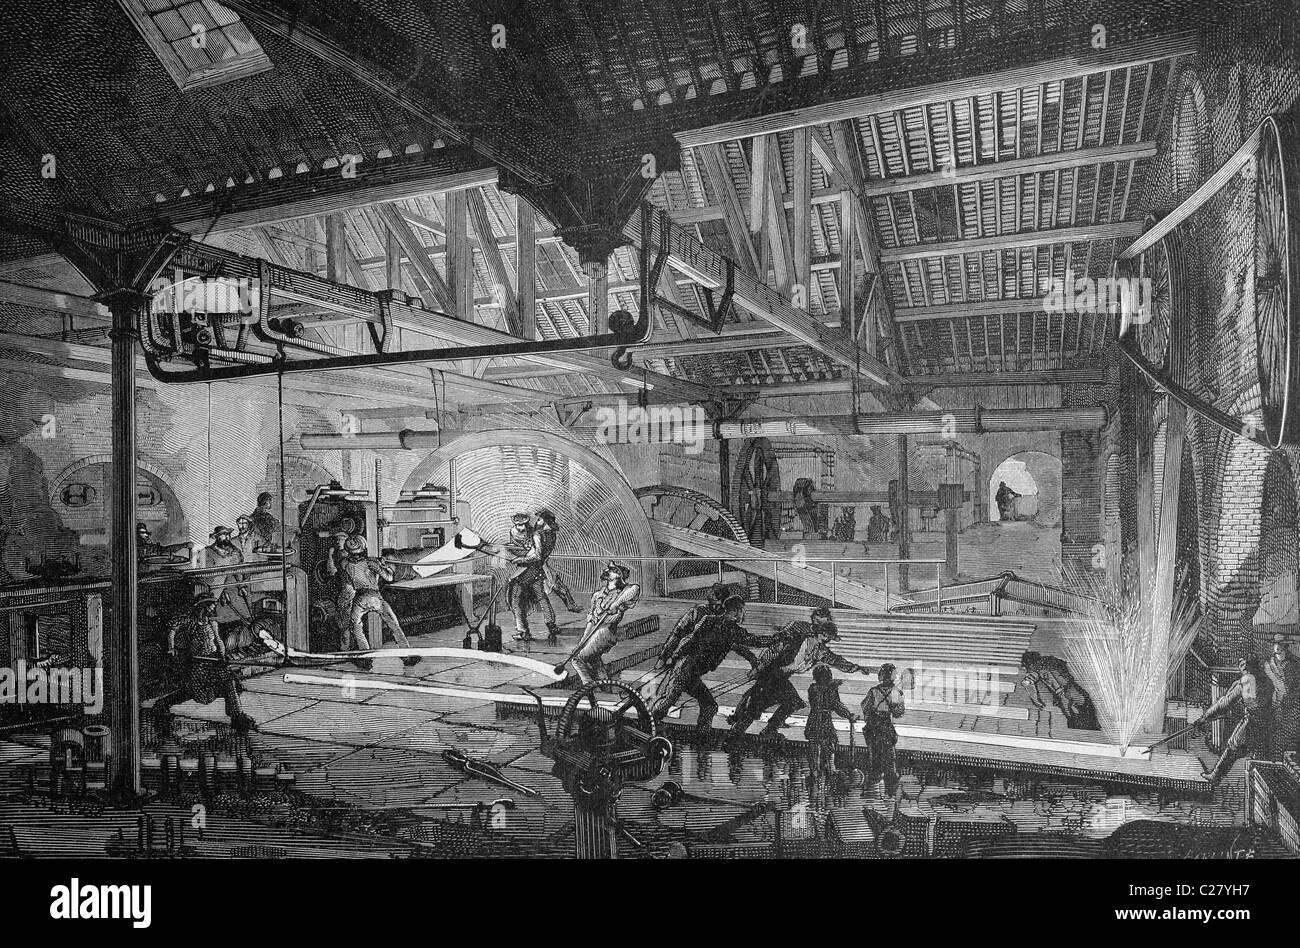 Smelting of railroad tracks, historical illustration, ca. 1893 - Stock Image